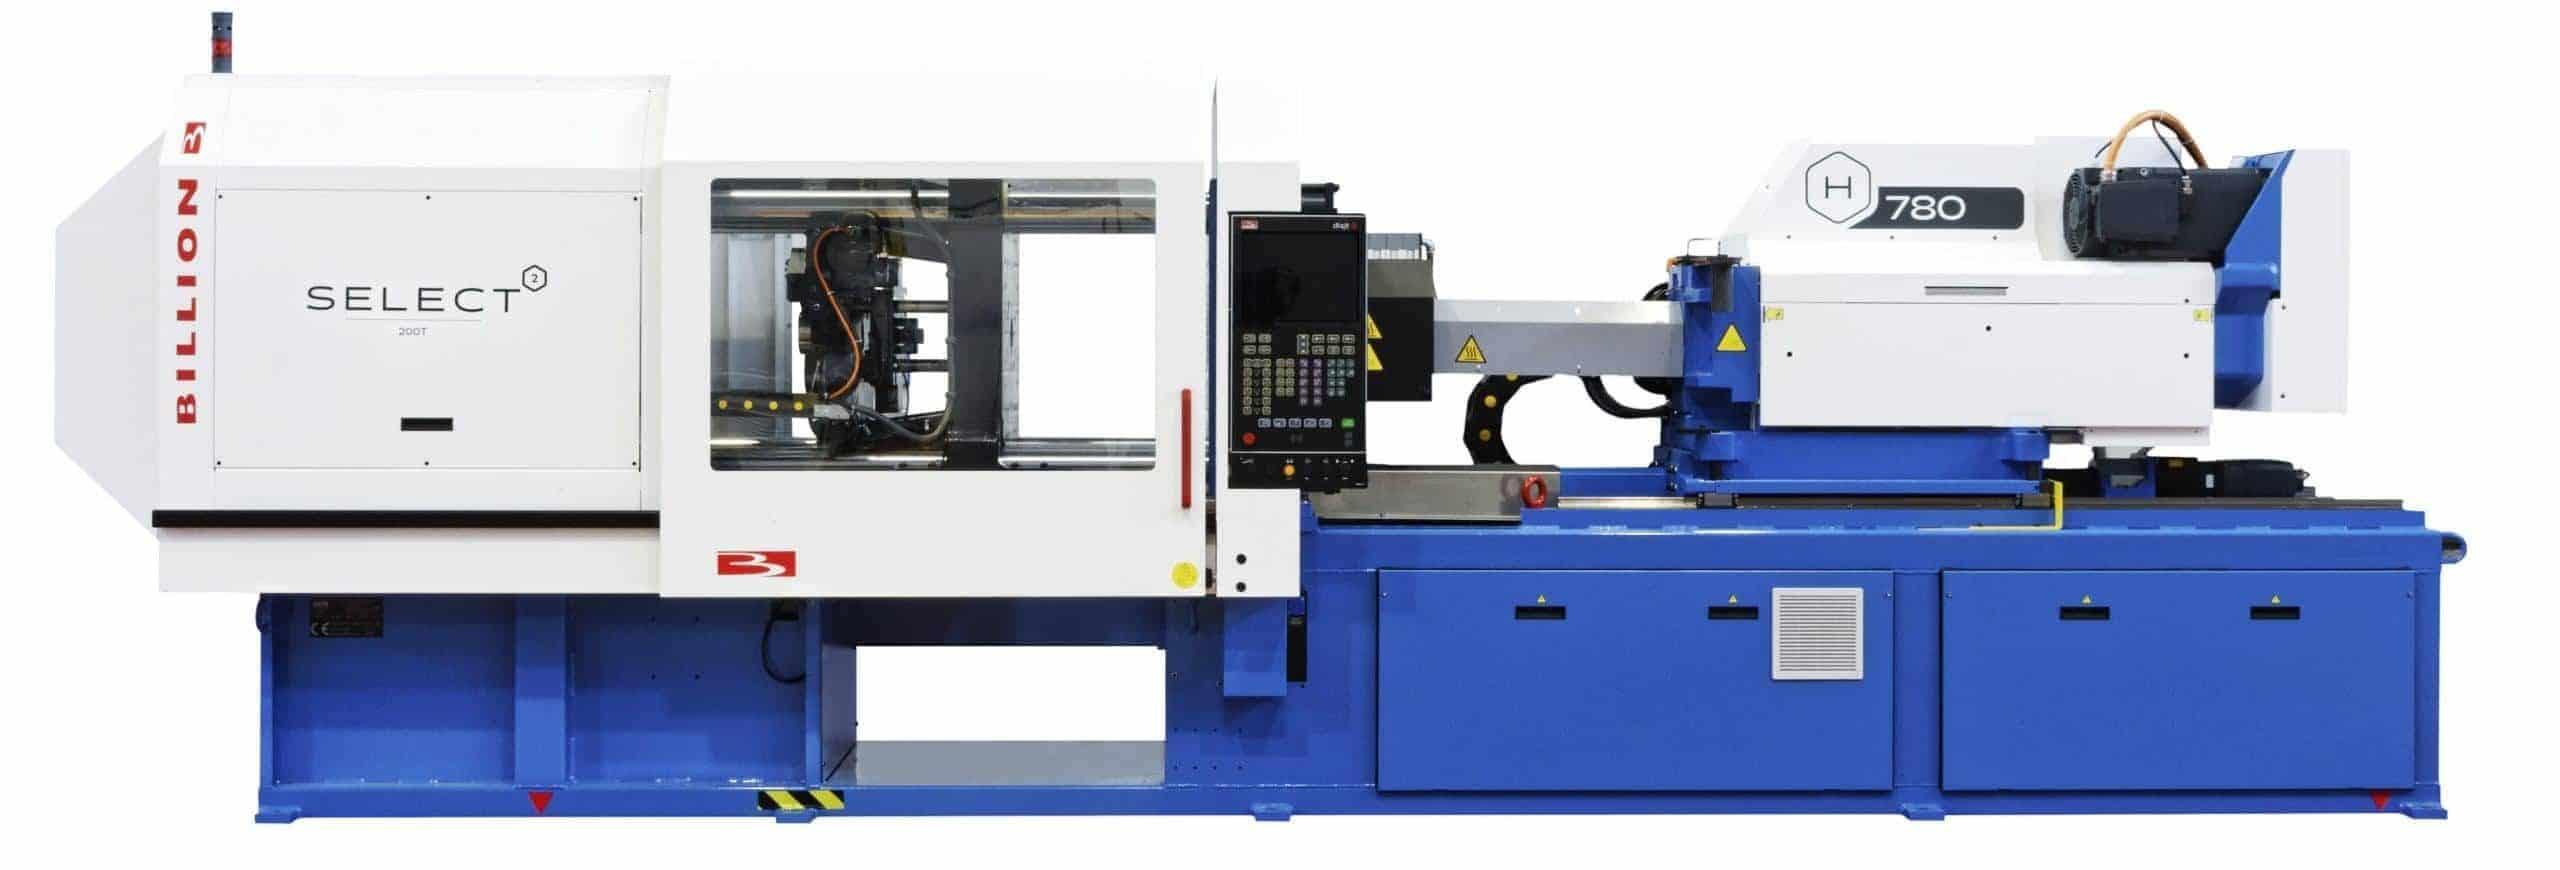 billion injection molding machines